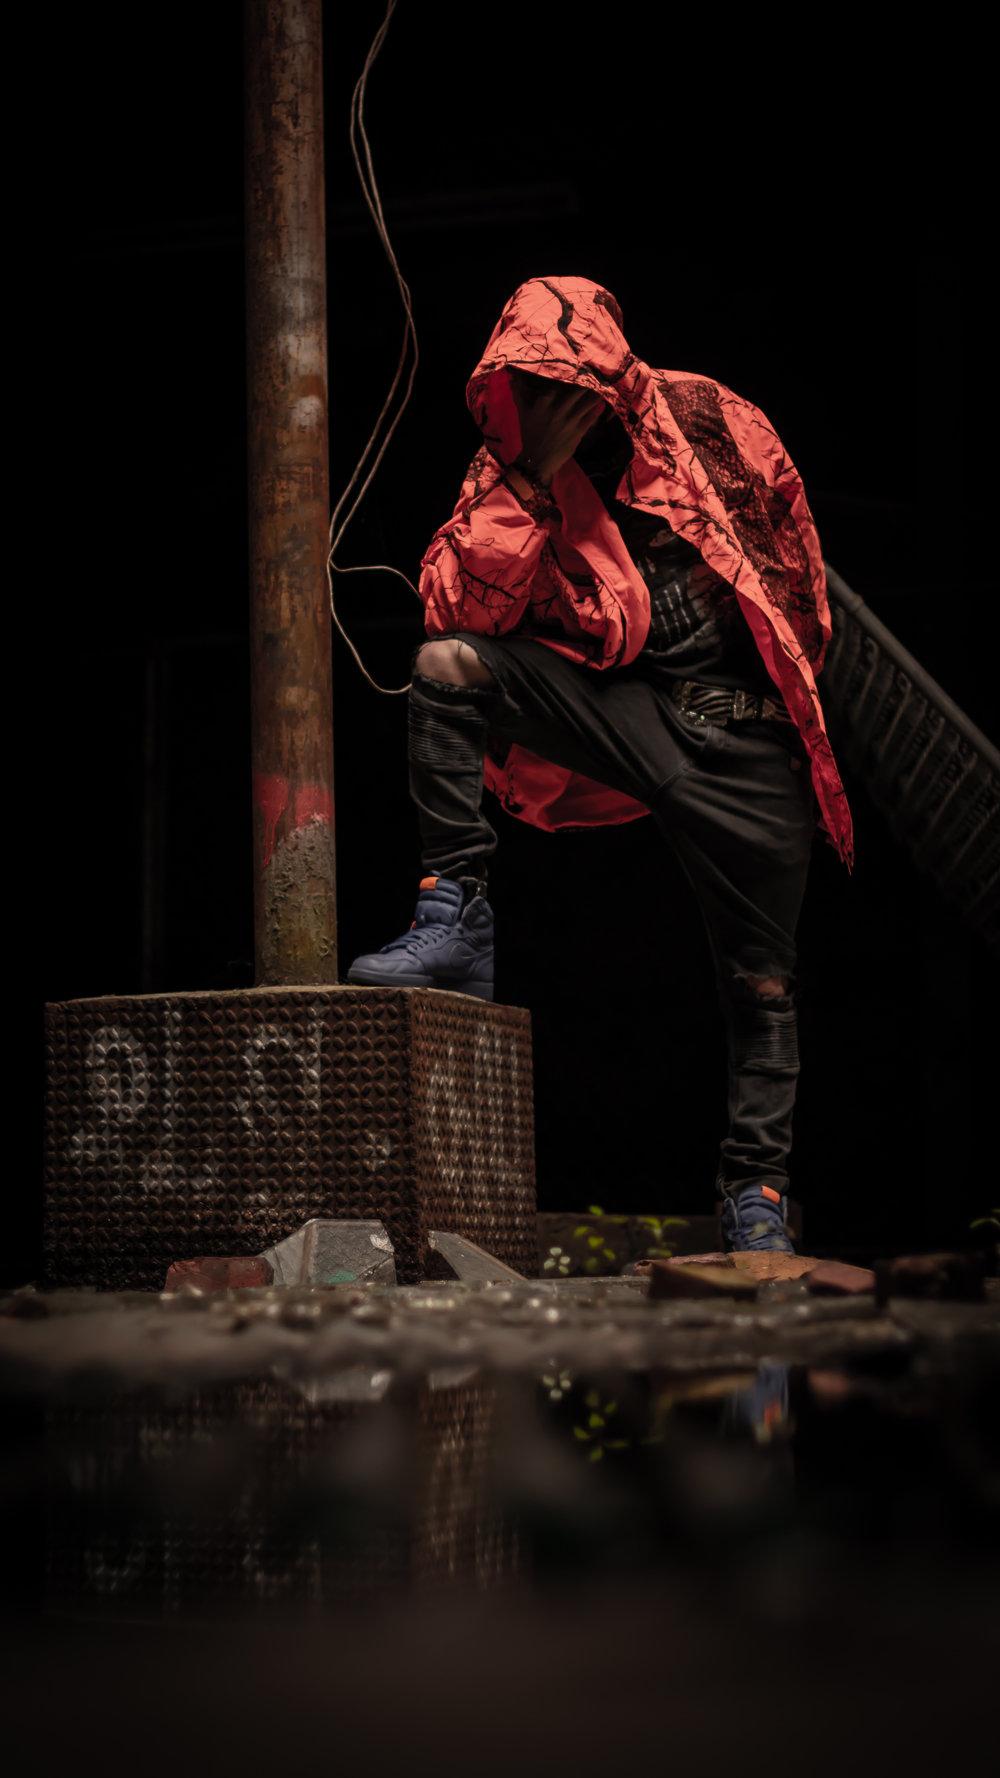 CODEY KACZYNSKI | PHOTOGRAPHER - BOSTON, MA